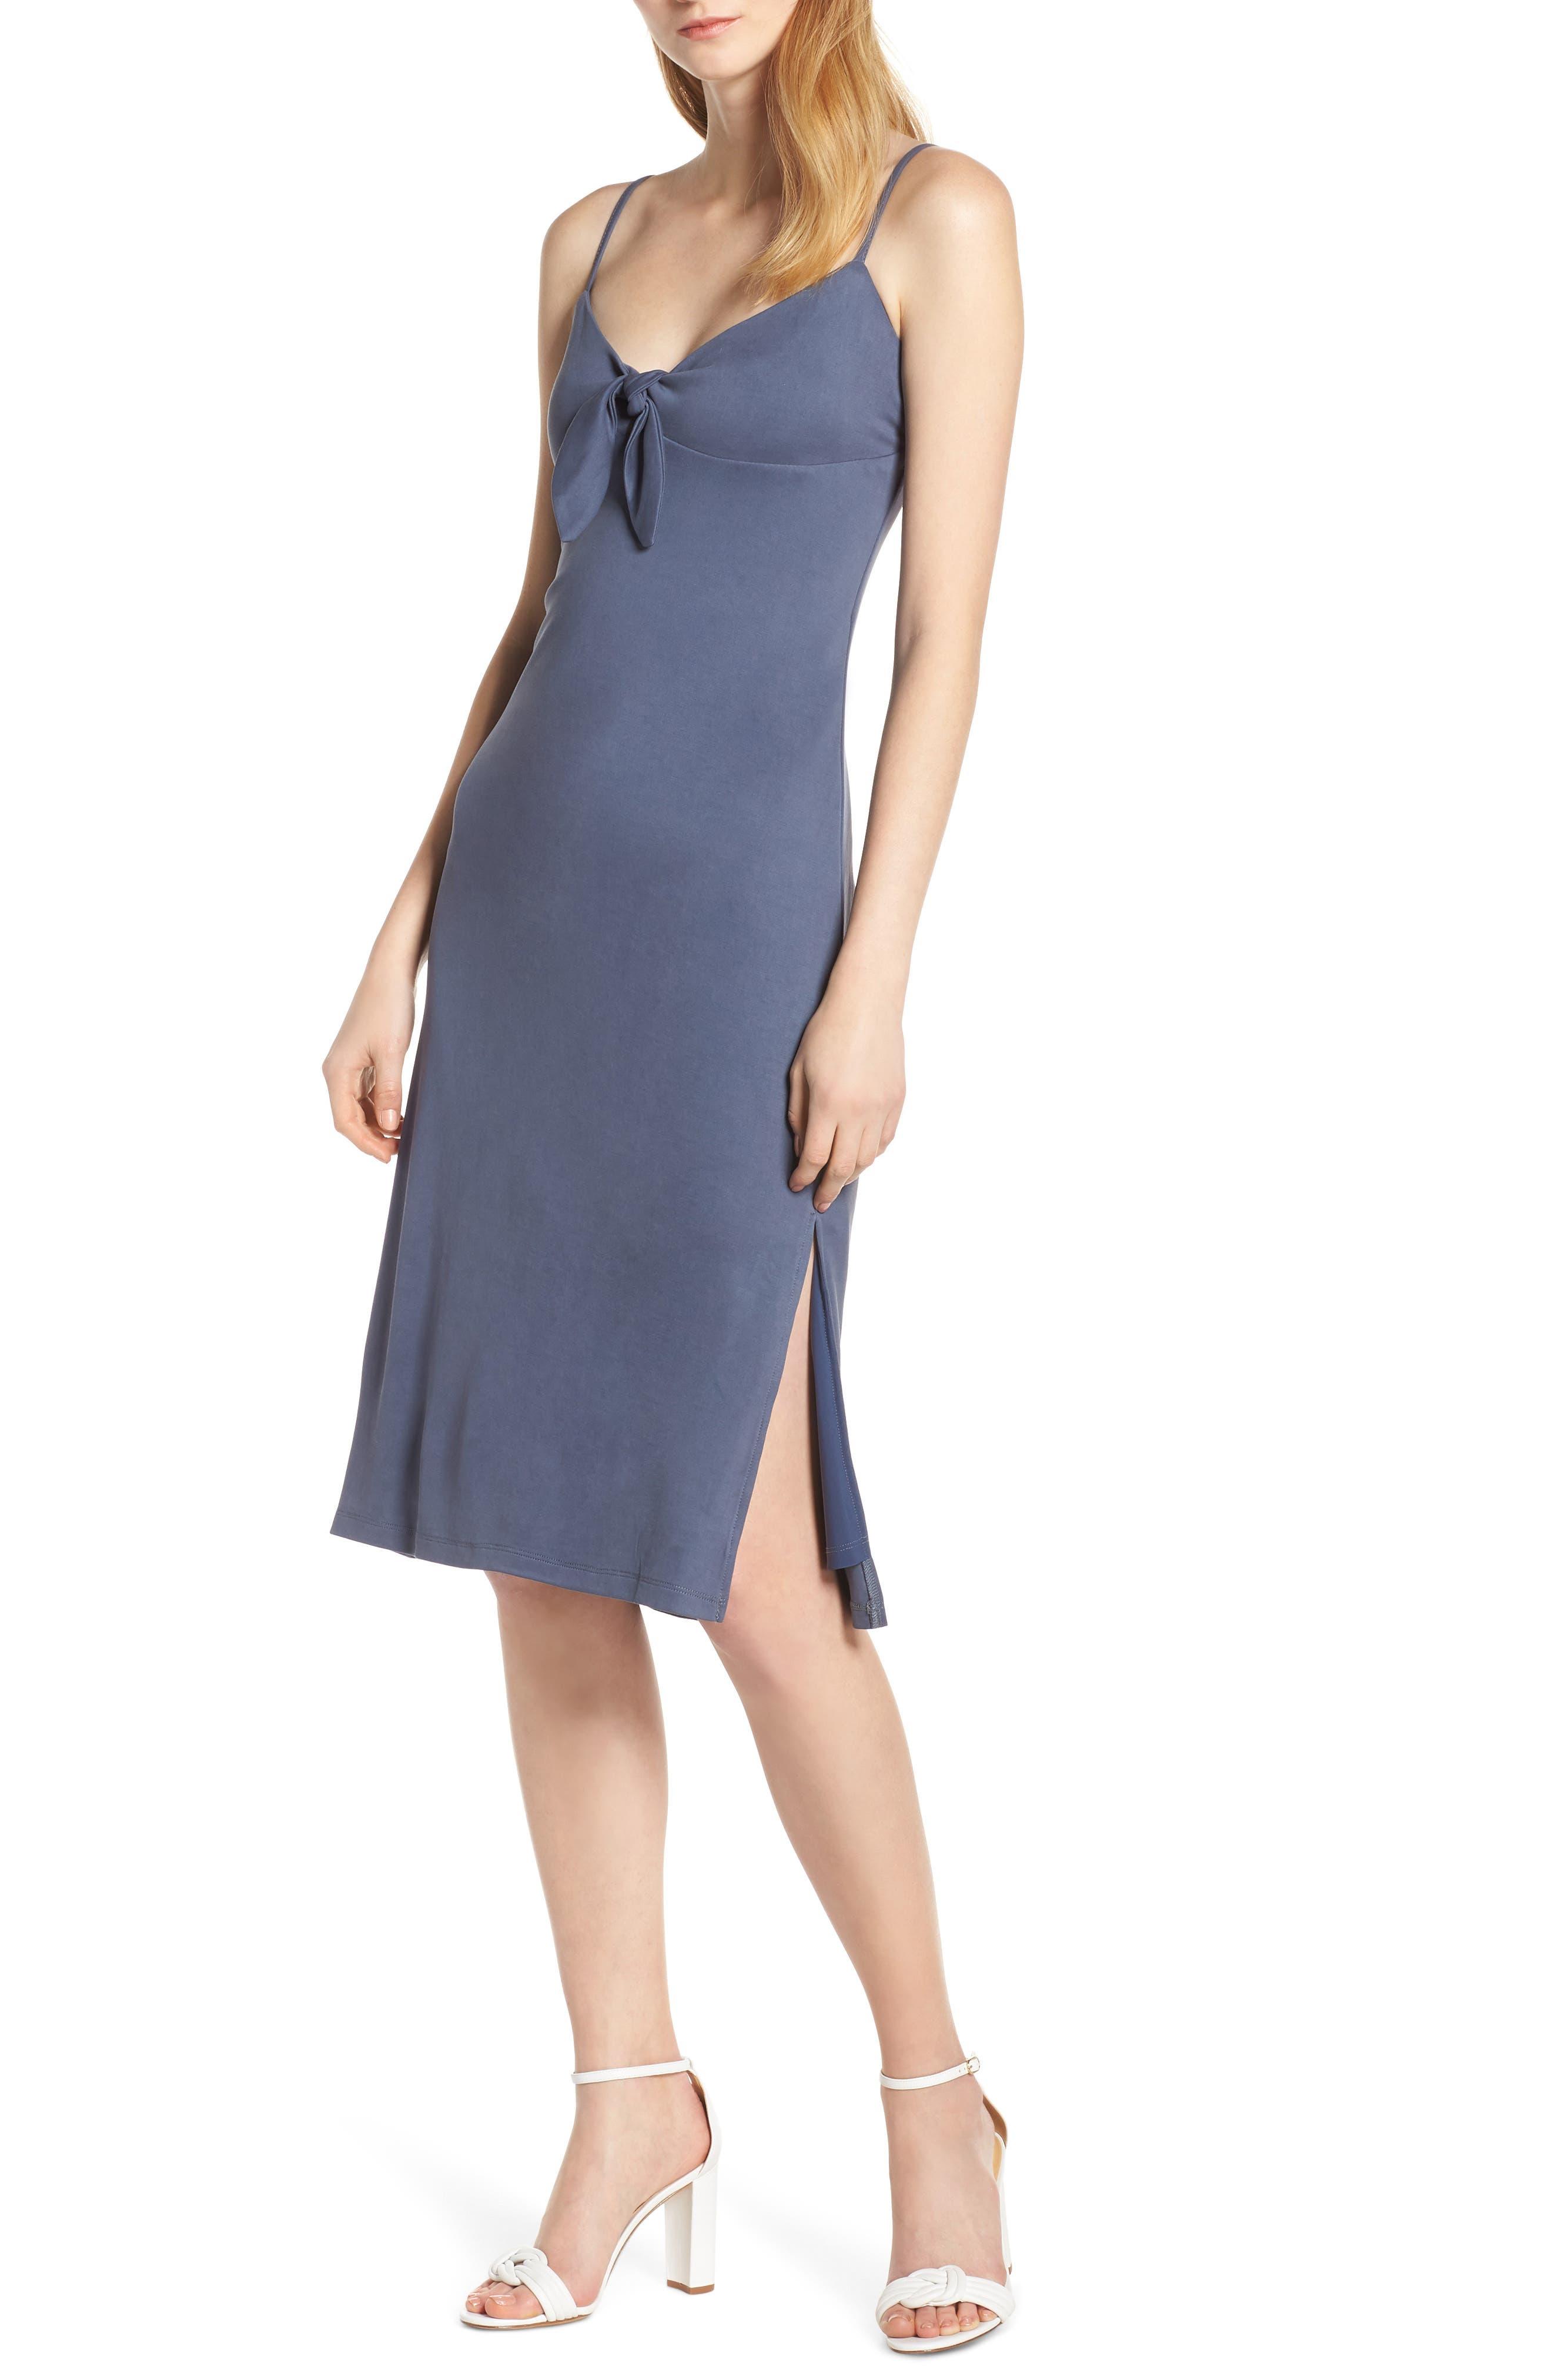 06ba0cee07a7 Women s Clothing